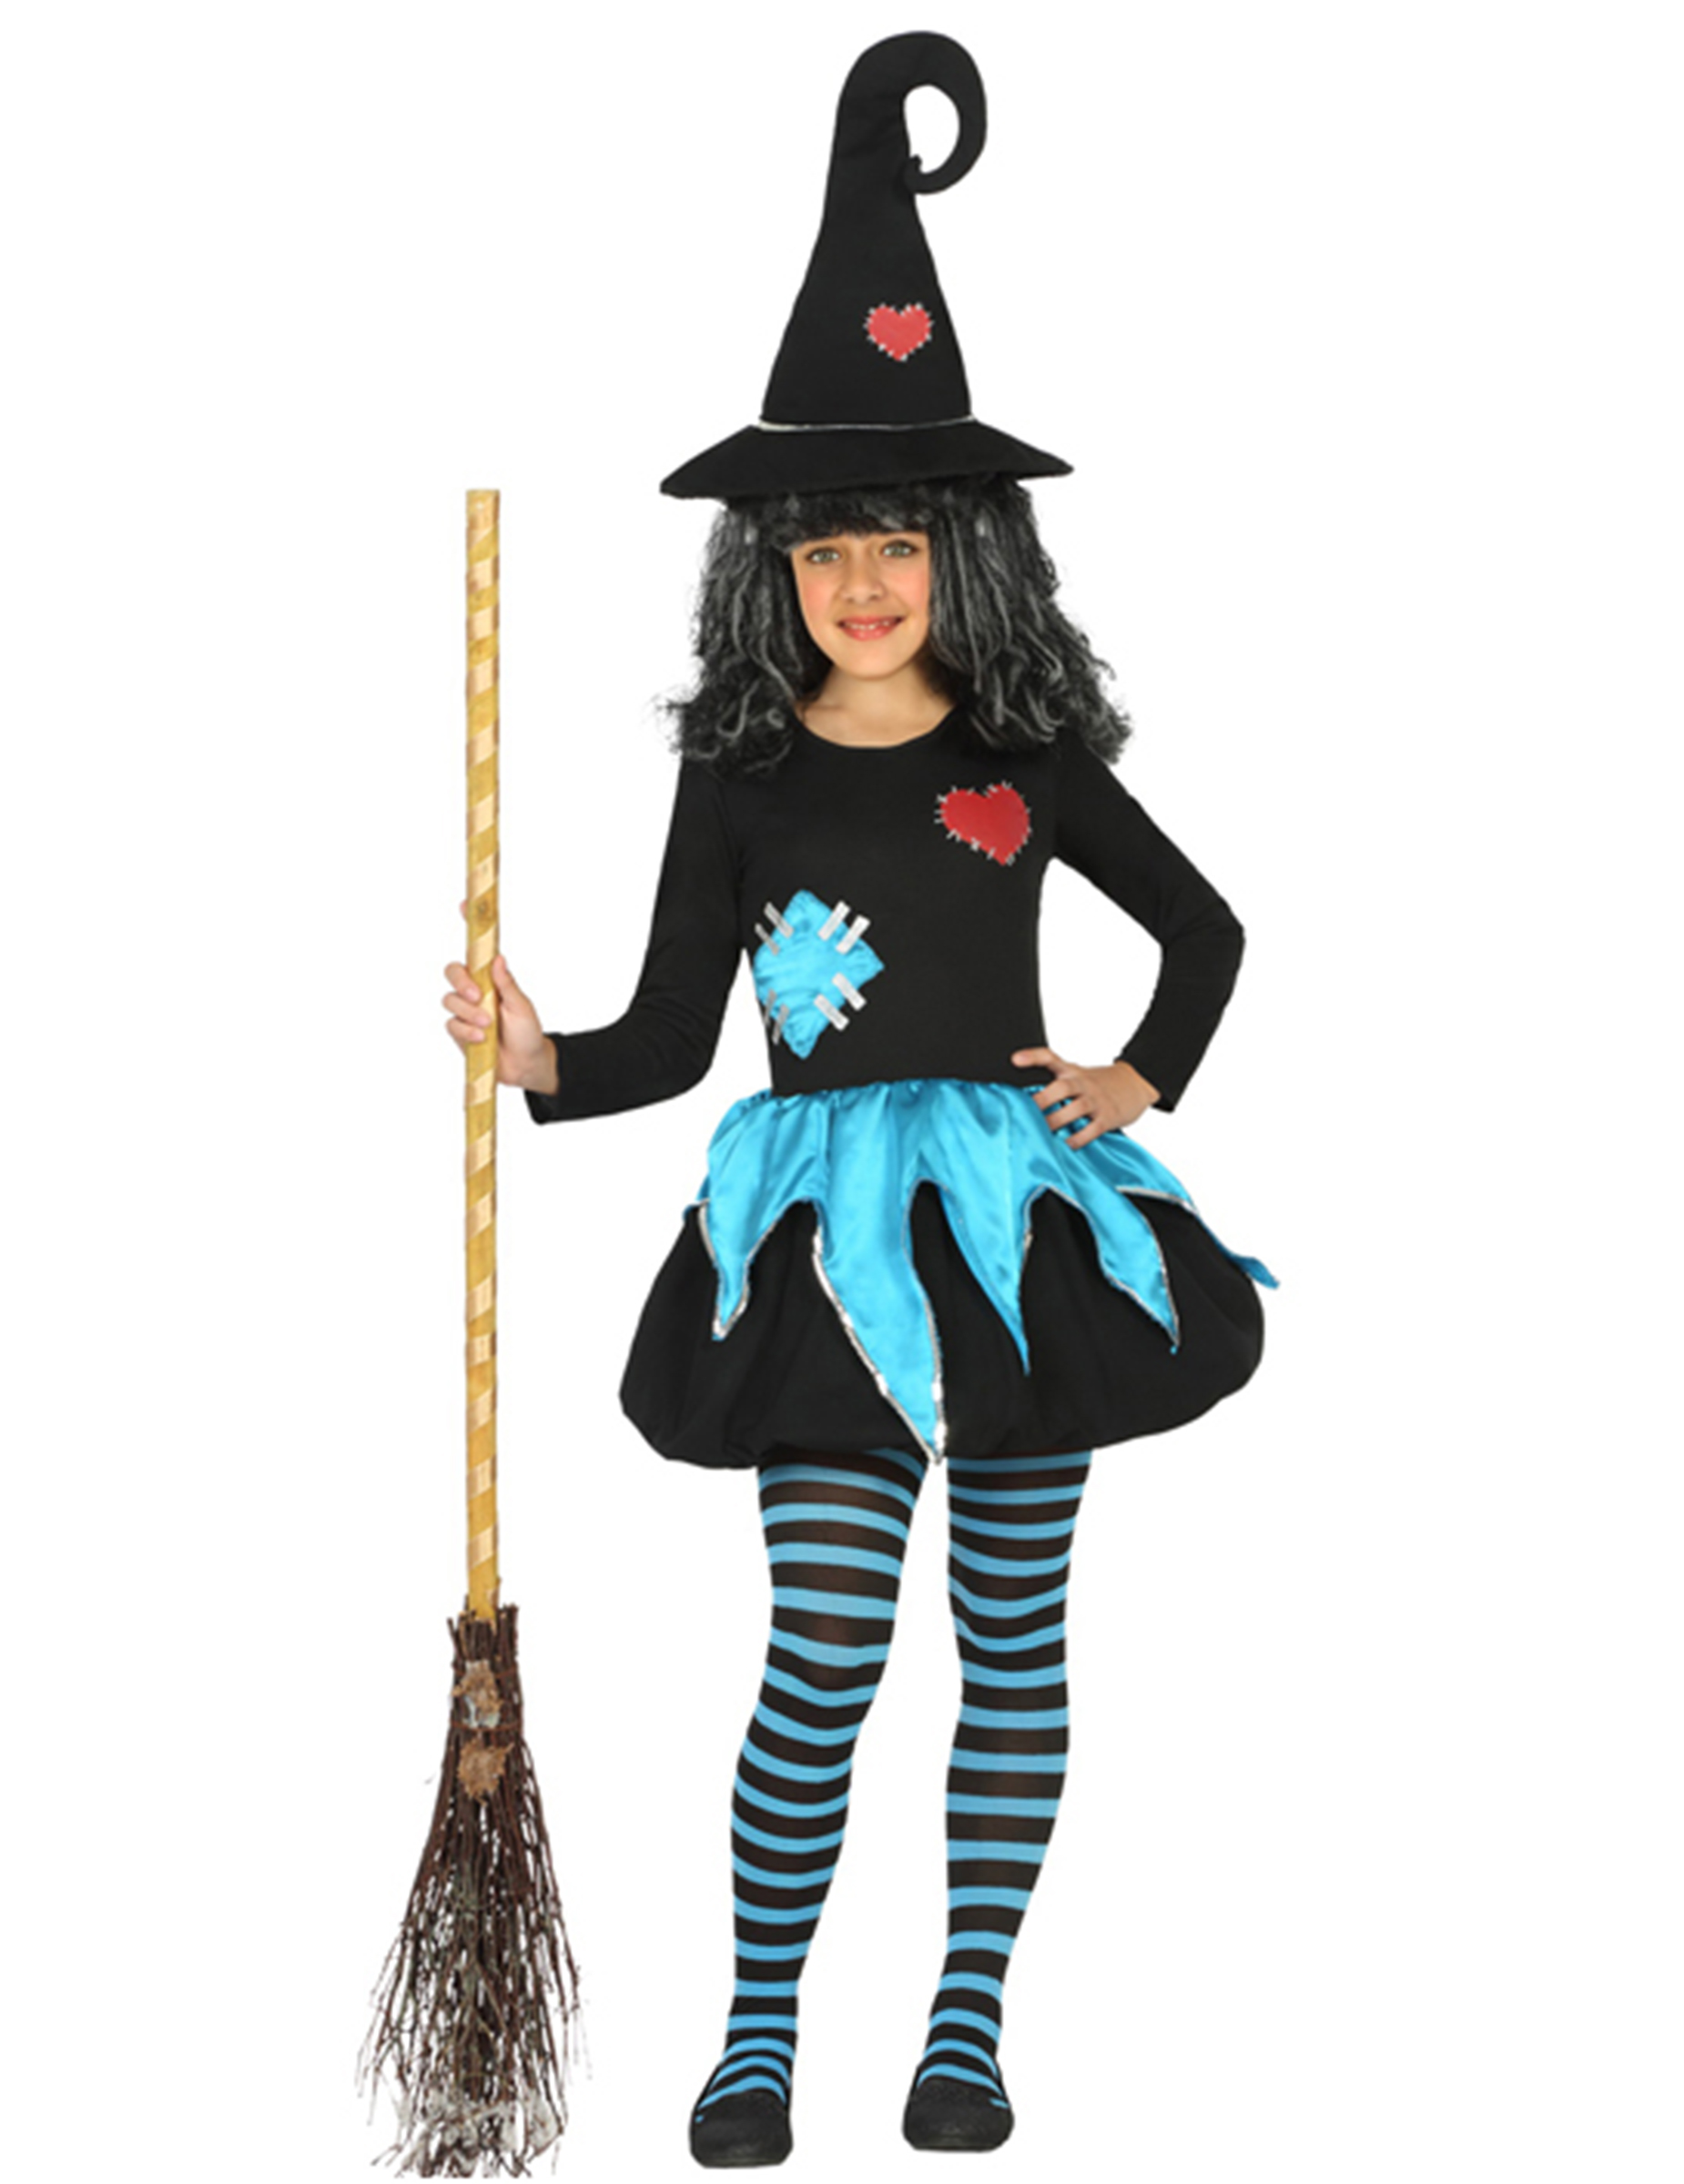 b6d13c5a32f3 Costume strega azzurrina bambina Halloween: Costumi bambini,e ...